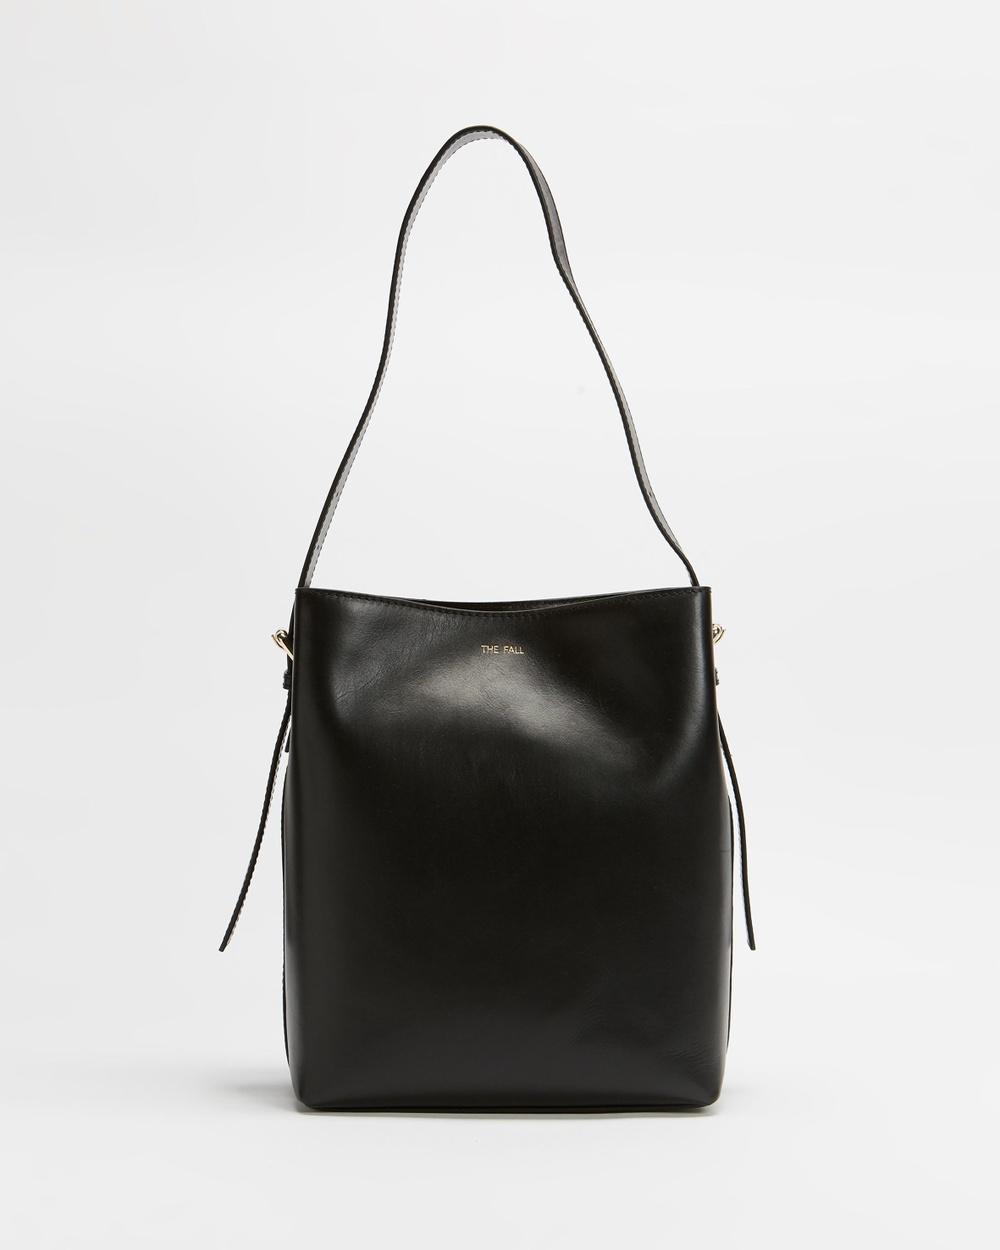 Fall The Label Hobo Bag Handbags Black Australia